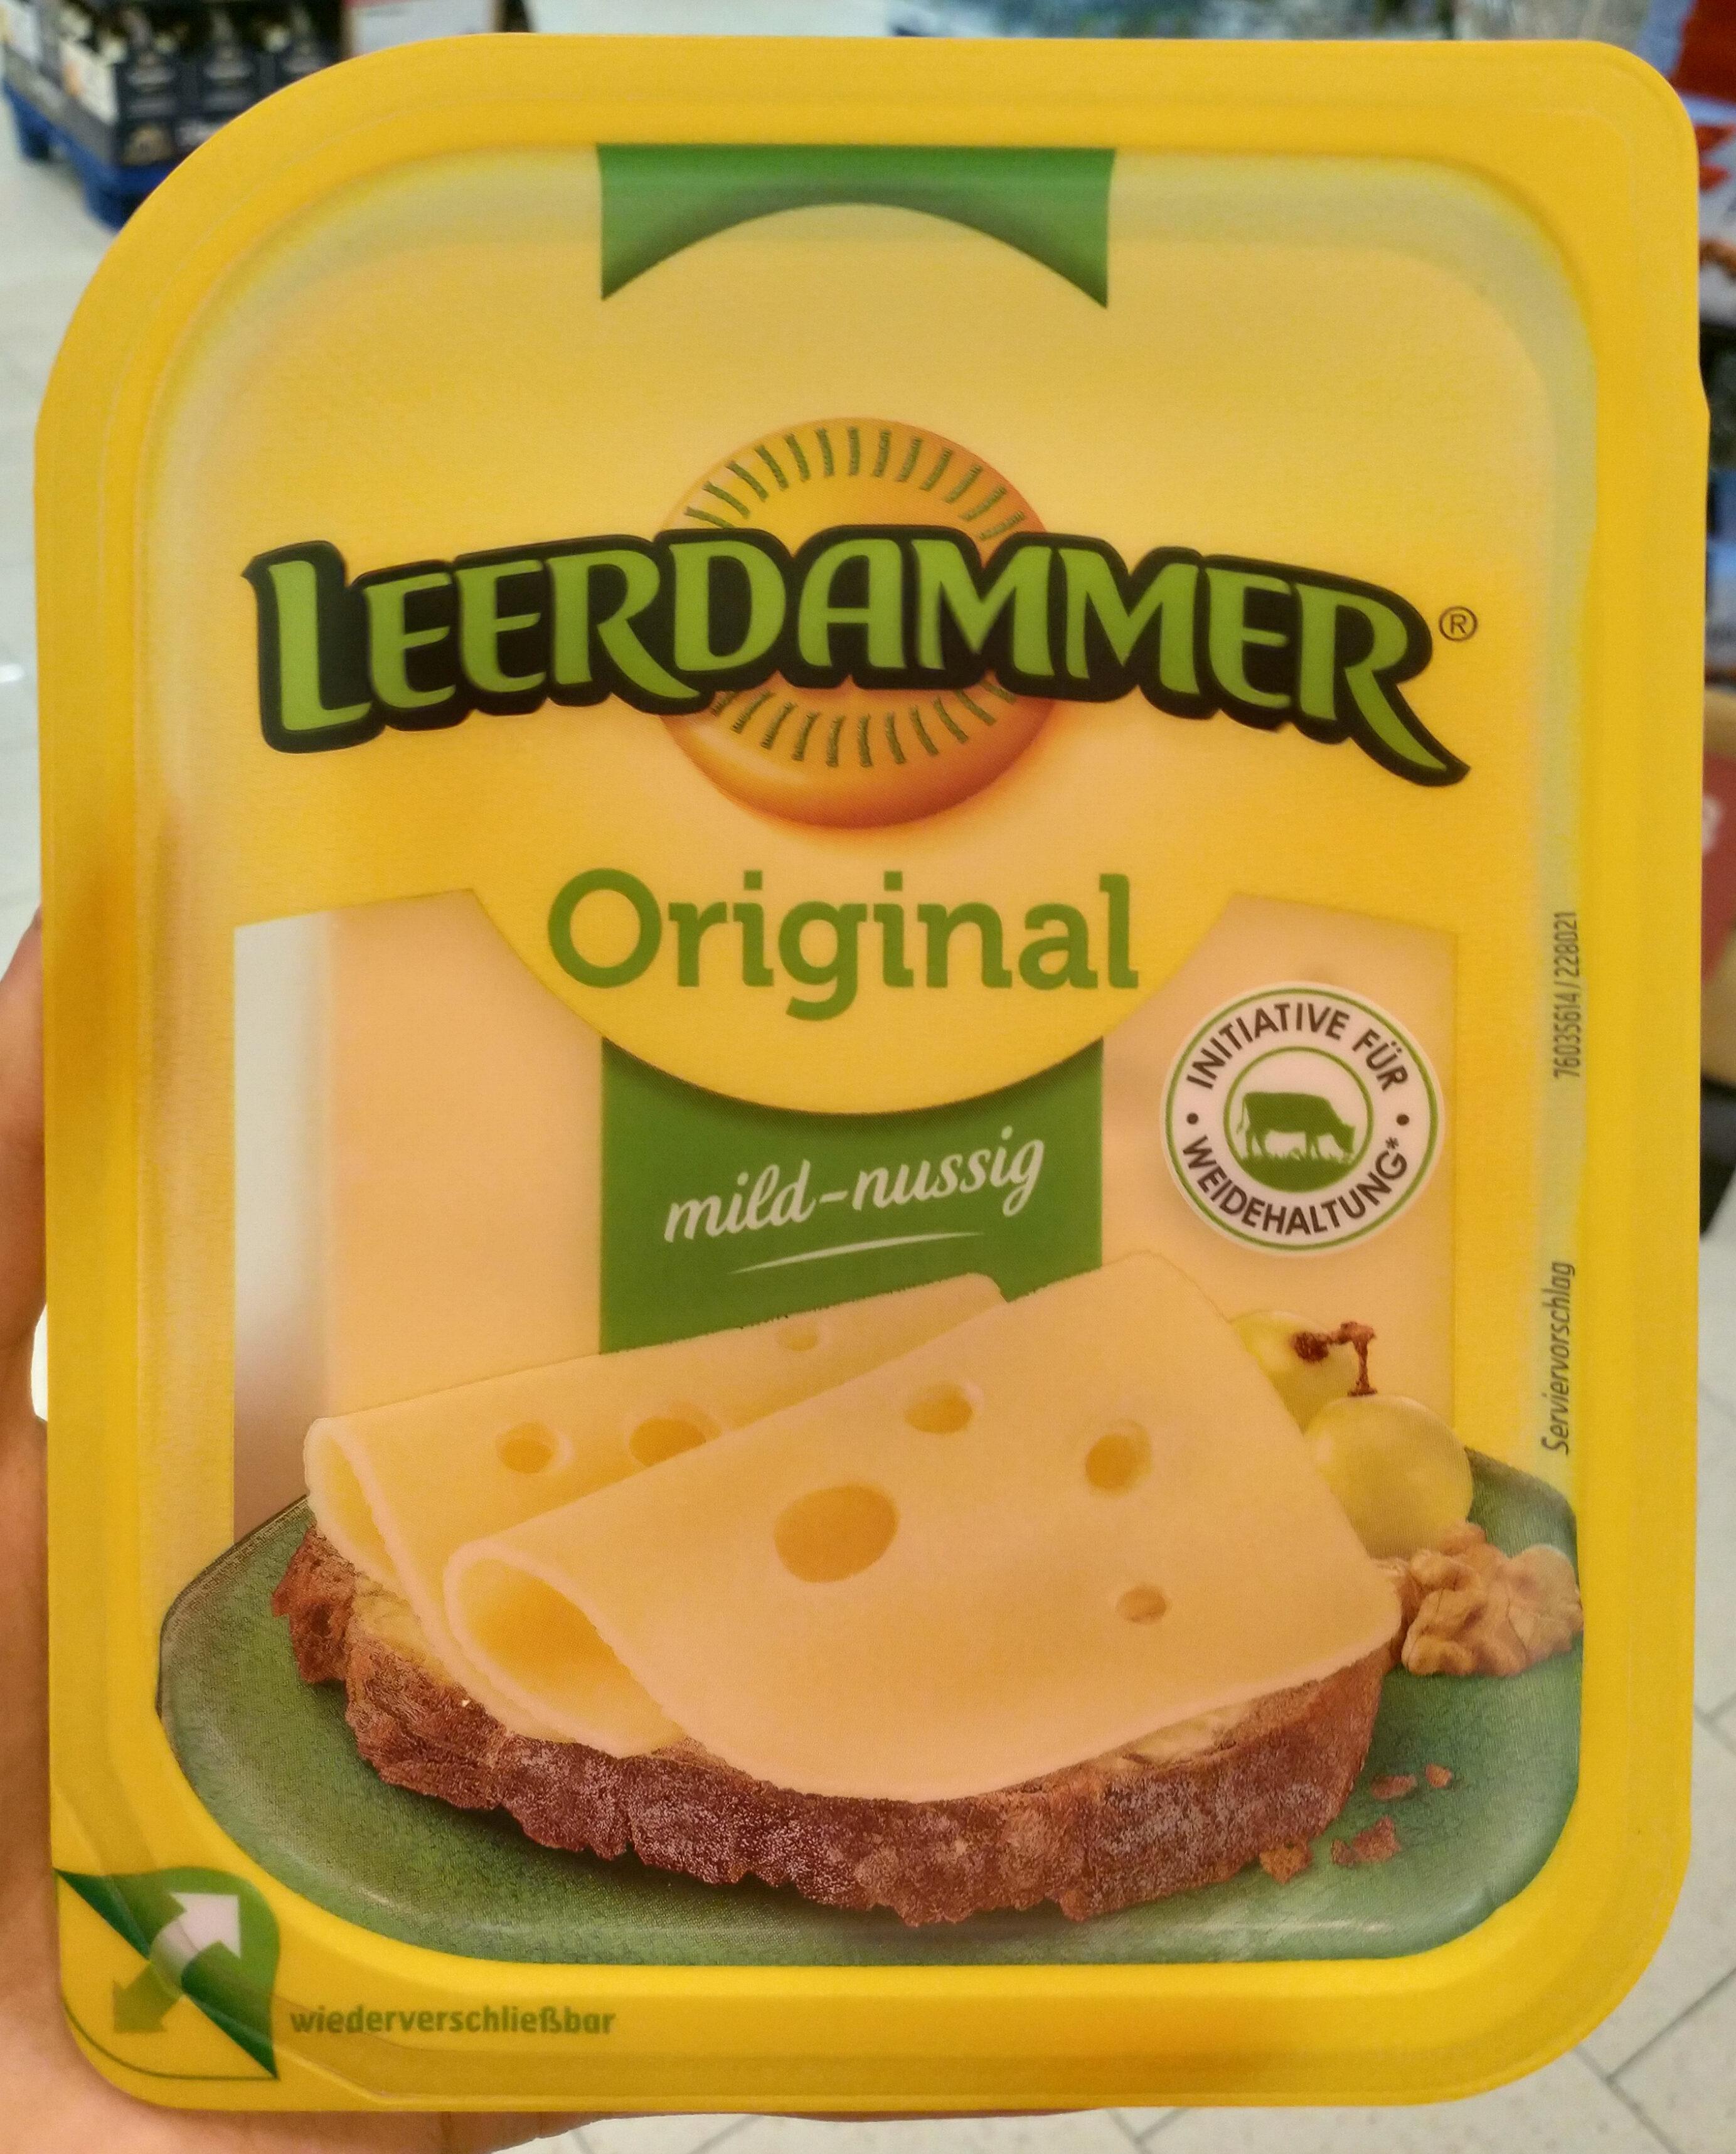 Leerdammer Original - Produit - de